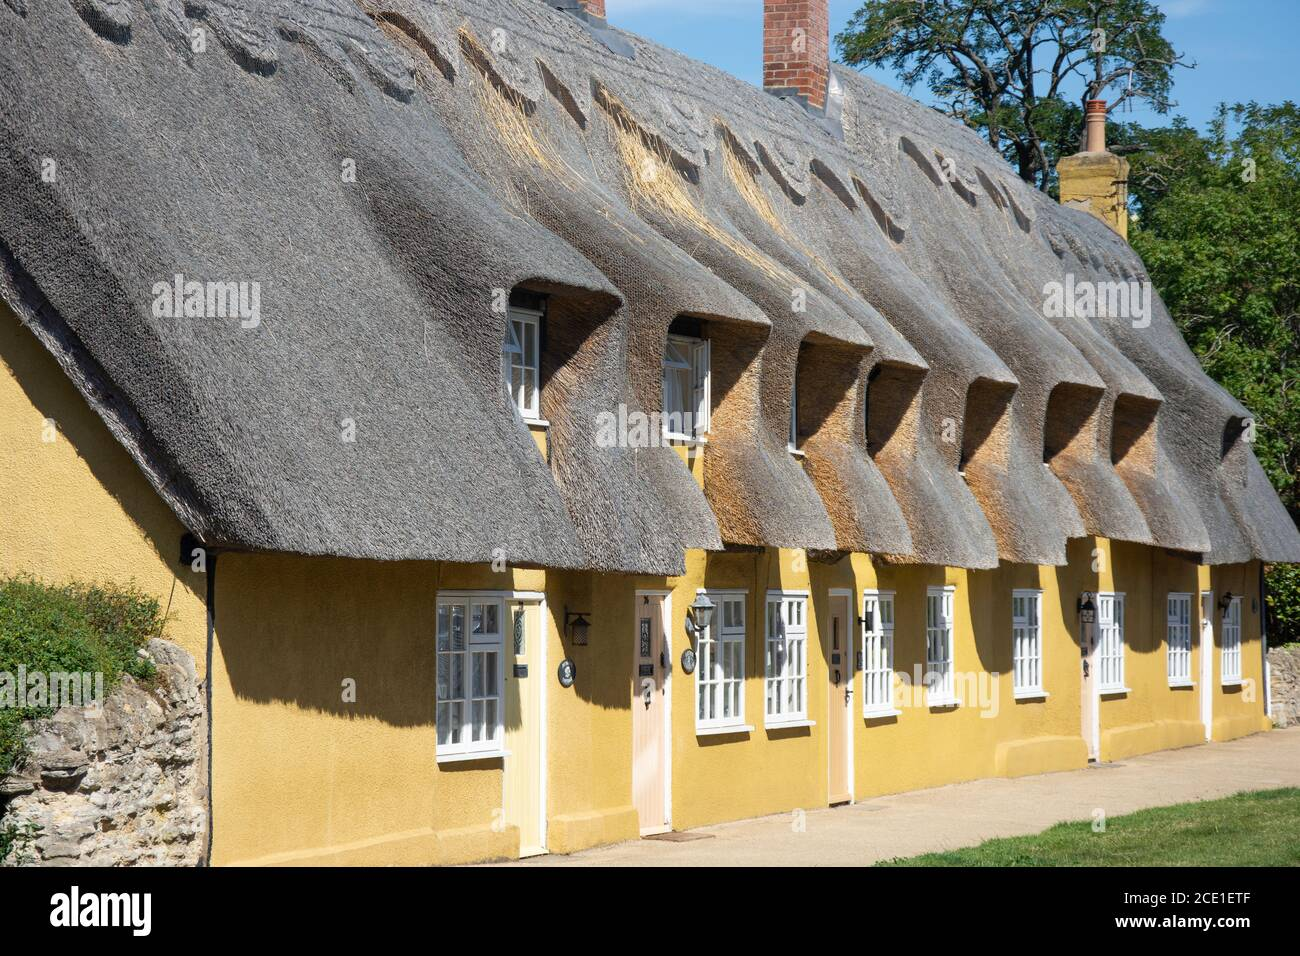 Casas de madera con techo de paja, Main Road, Biddenham, Bedfordshire, Inglaterra, Reino Unido Foto de stock